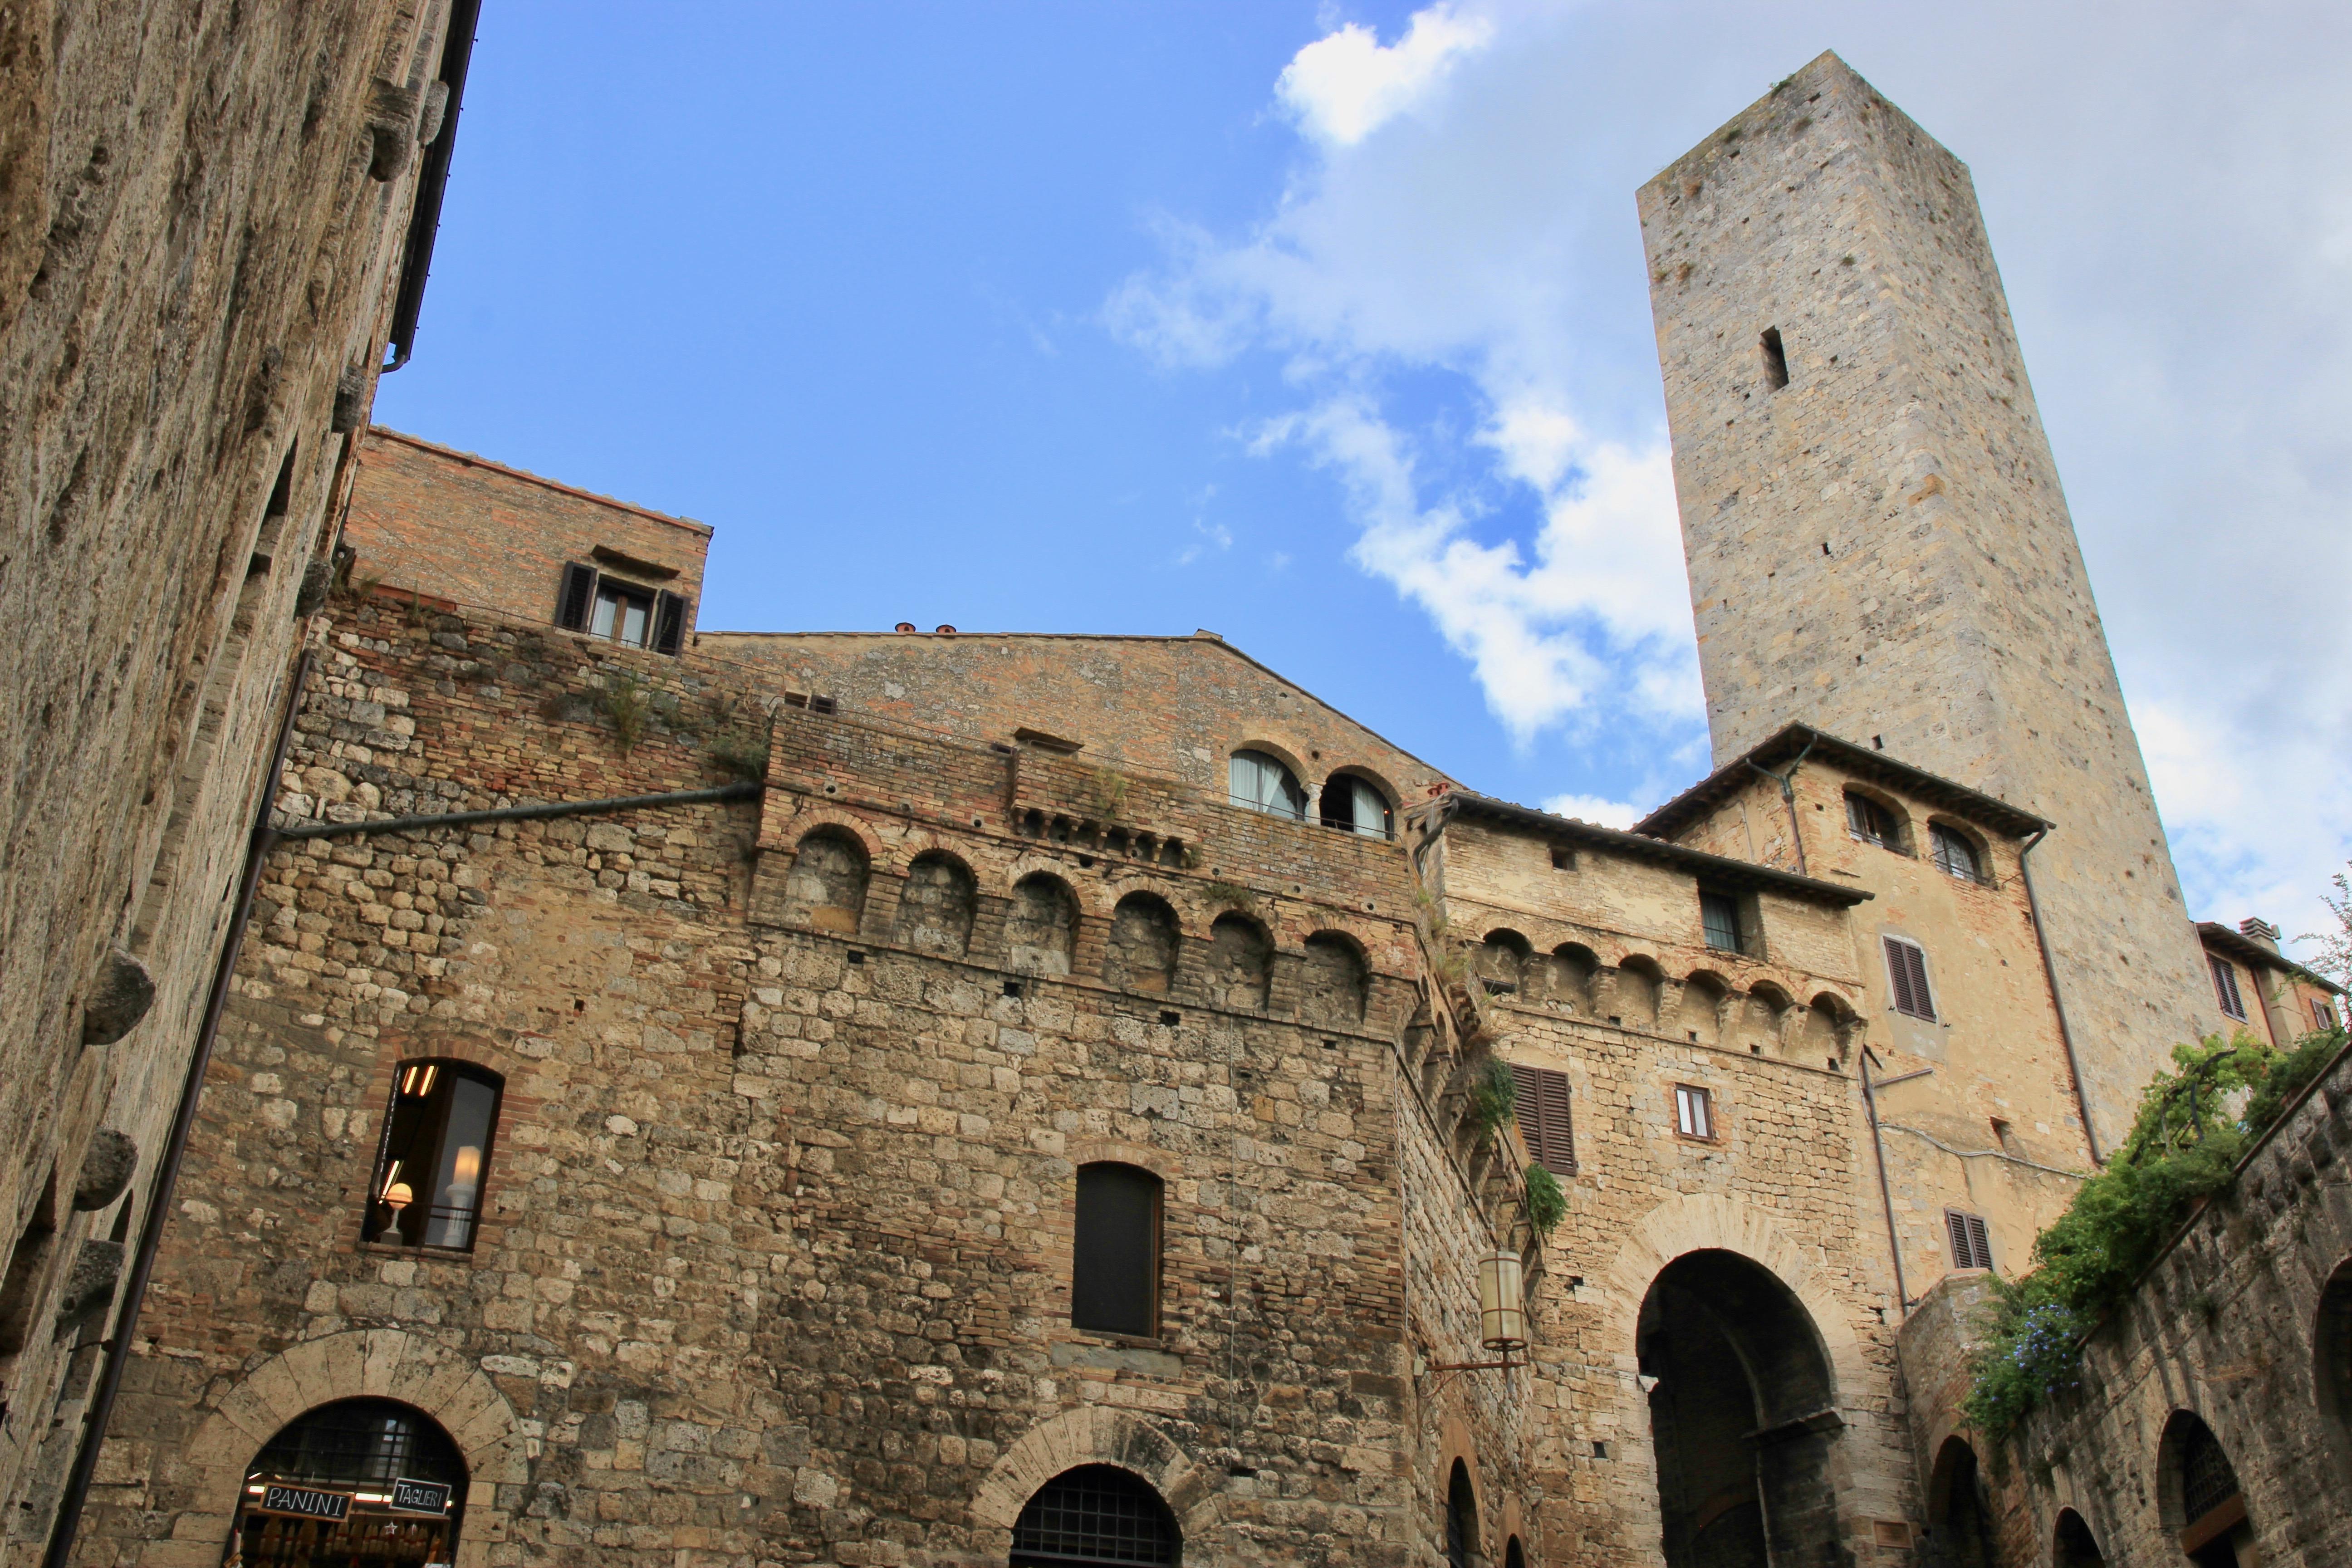 Borgo di San Gimignano